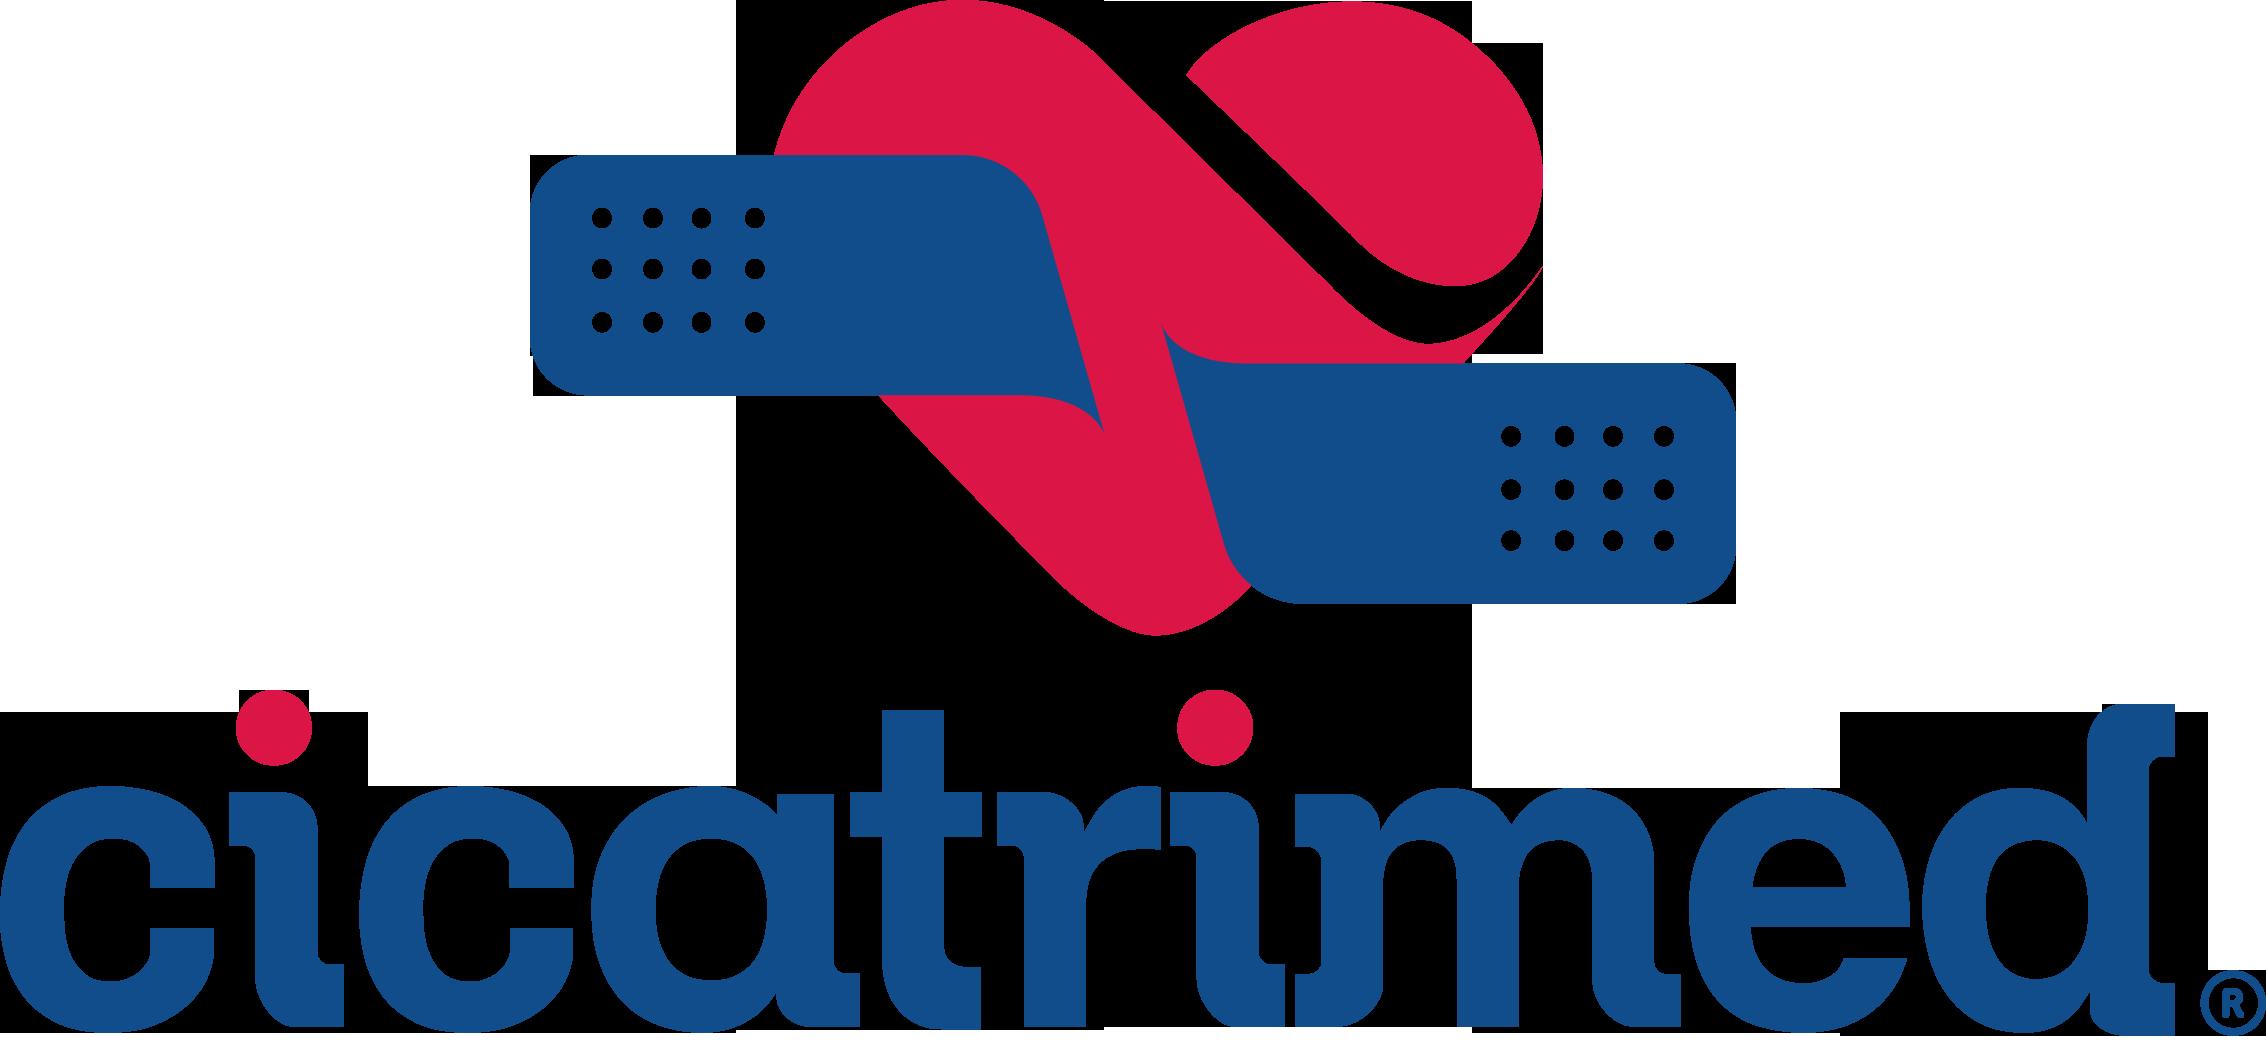 d-logo-1.png